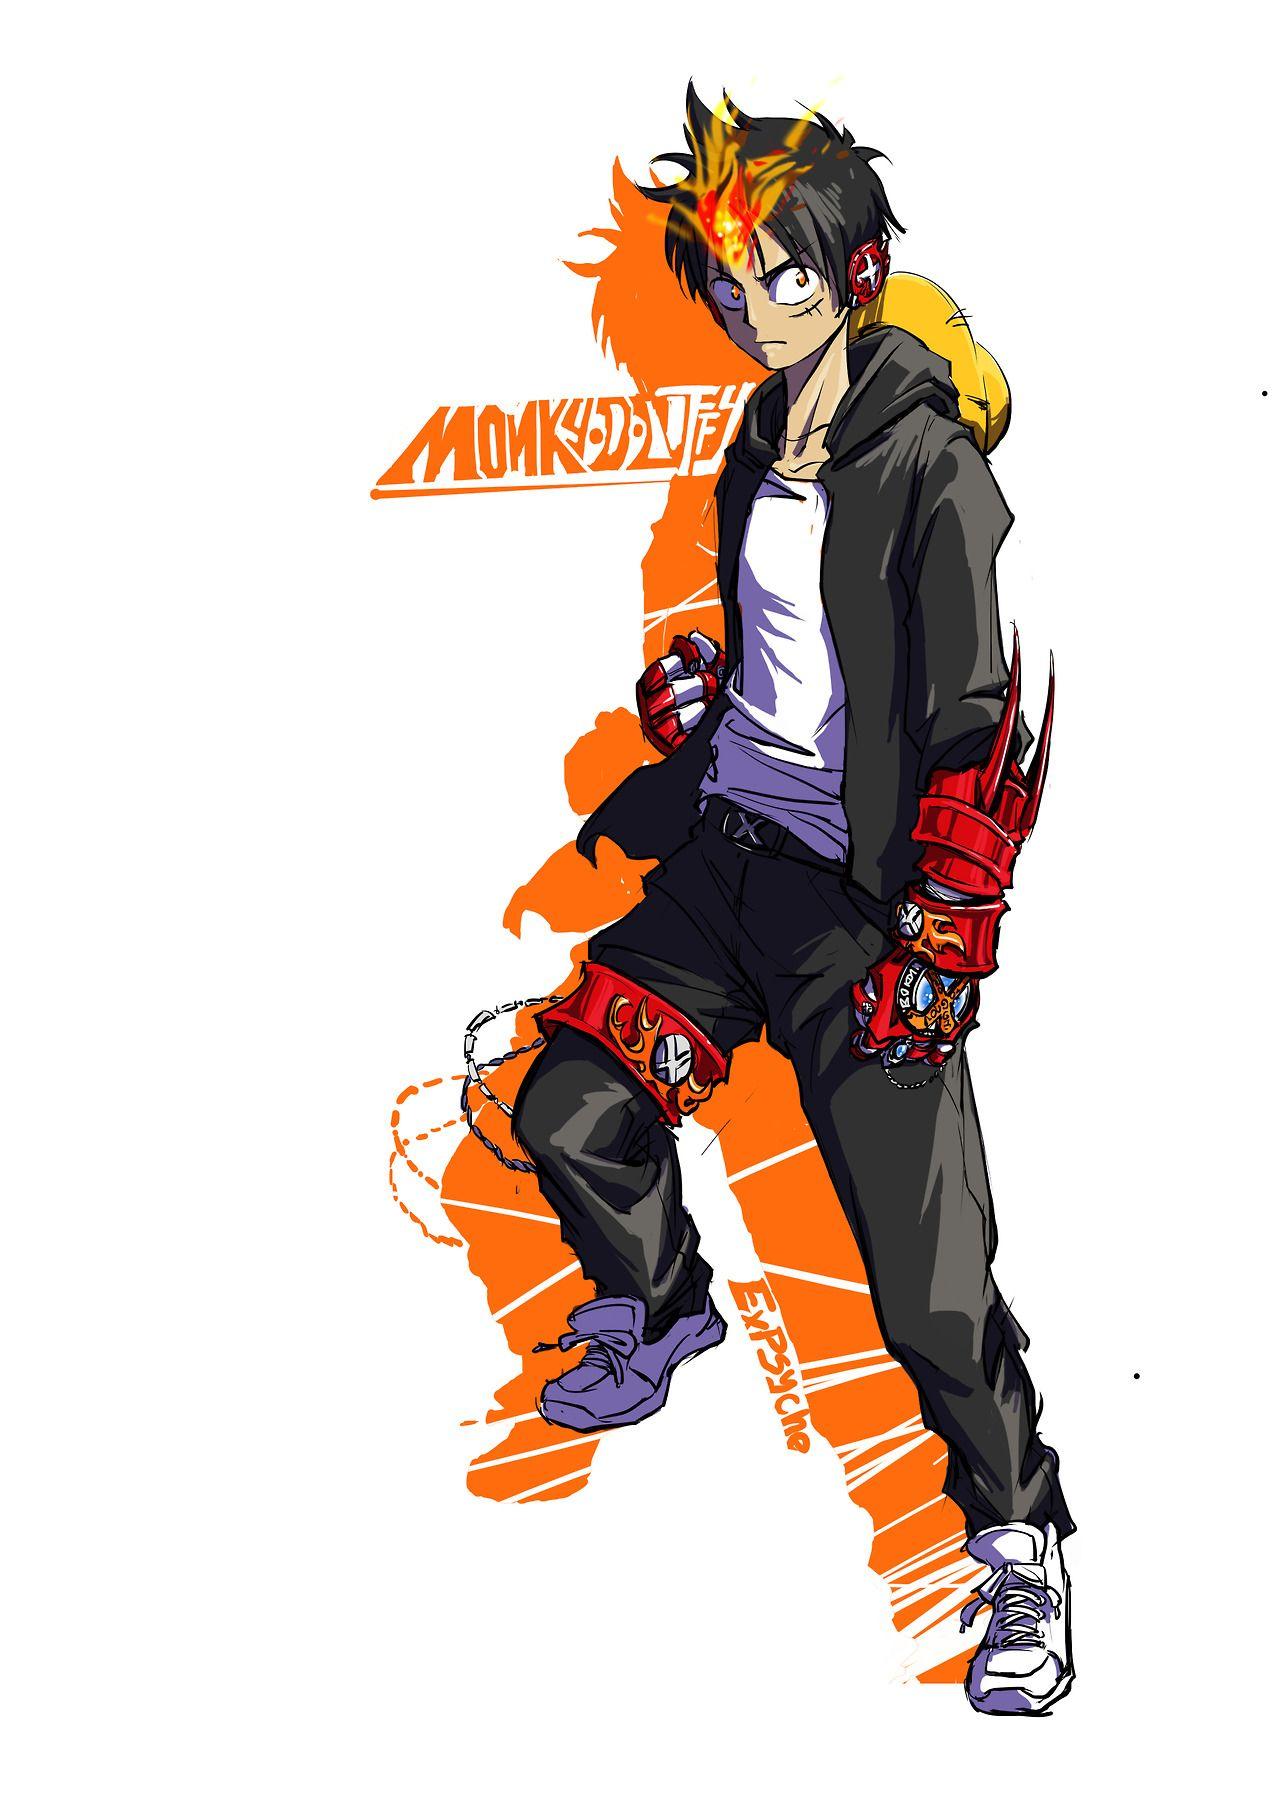 Monkey D Luffy One Piece Crossover One Piece Anime Reborn Katekyo Hitman